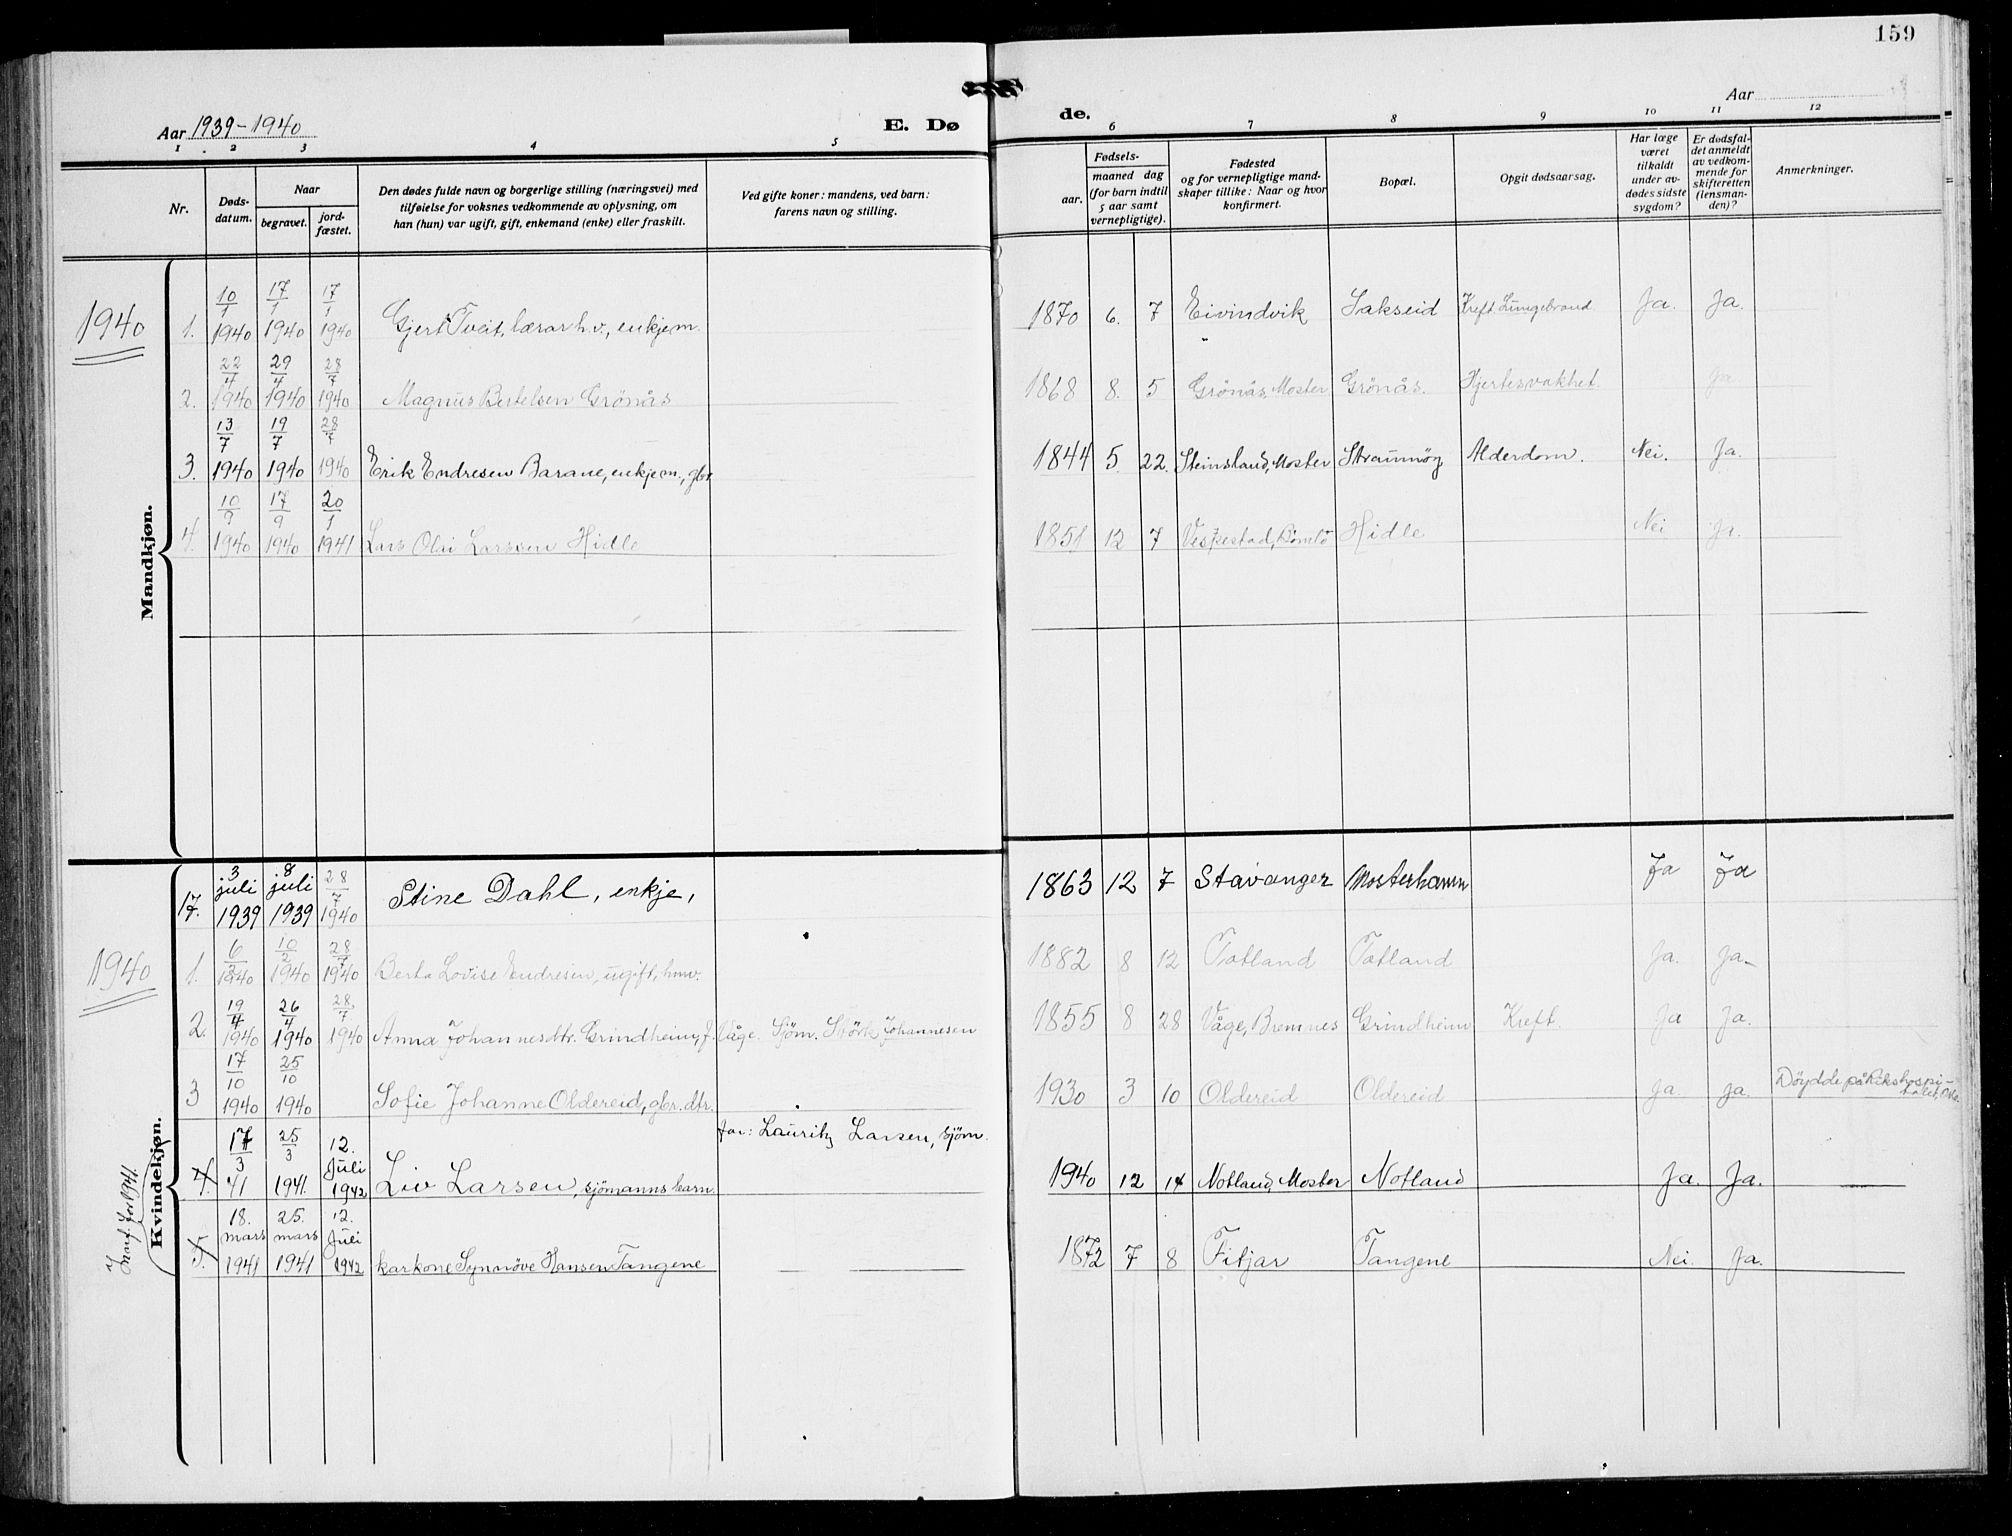 SAB, Finnås sokneprestembete, H/Ha/Hab/Haba/L0005: Klokkerbok nr. A 5, 1924-1945, s. 159